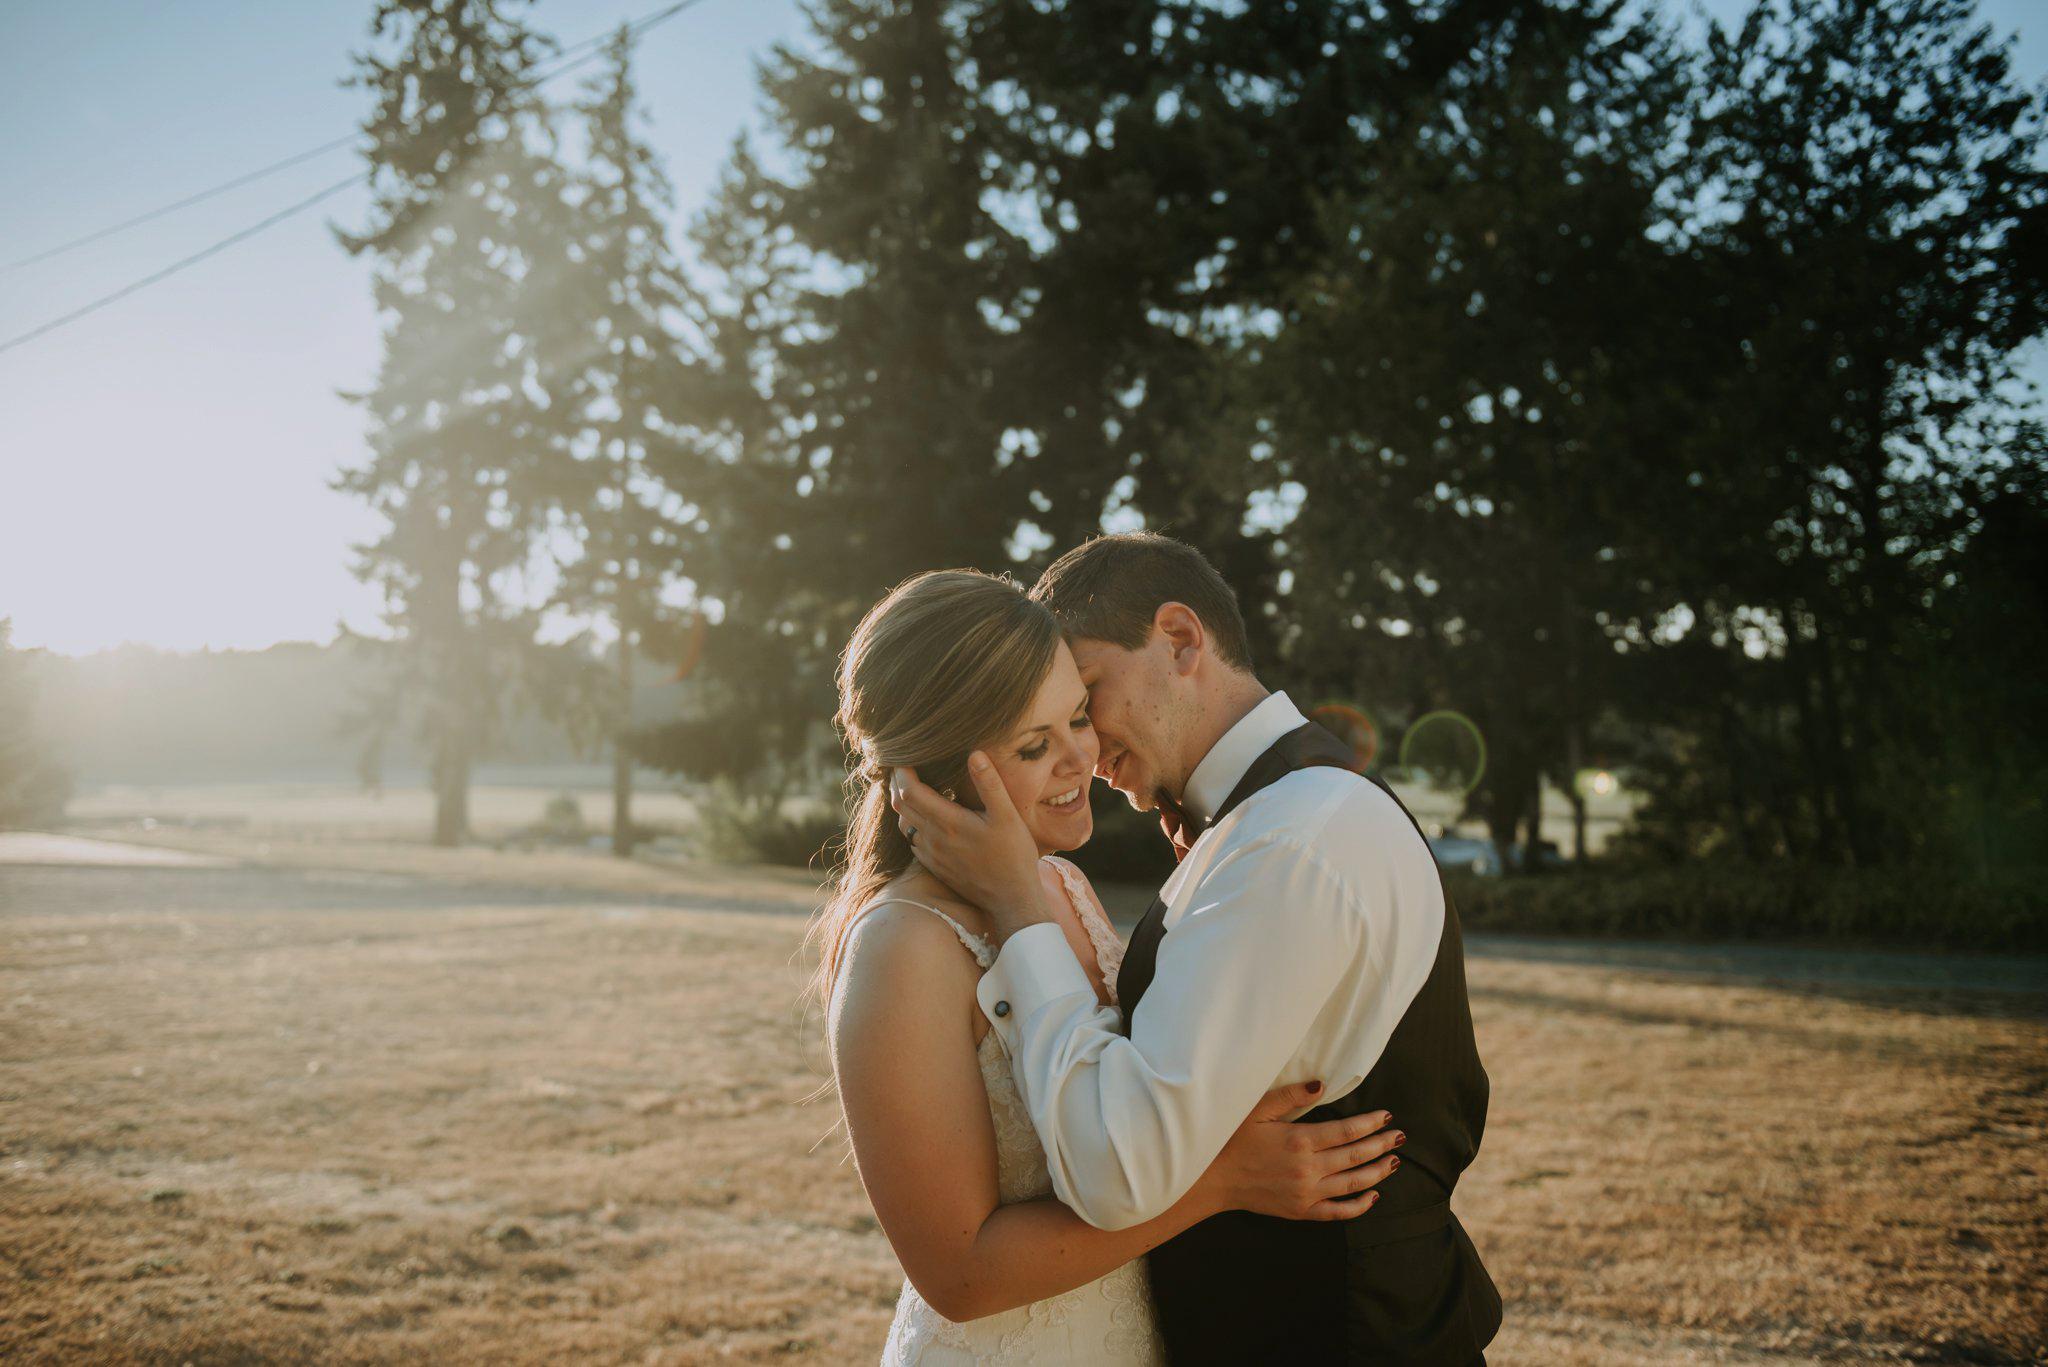 kristen-and-cody-the-kelley-farm-wedding-seattle-photographer-caitlyn-nikula-92.jpg